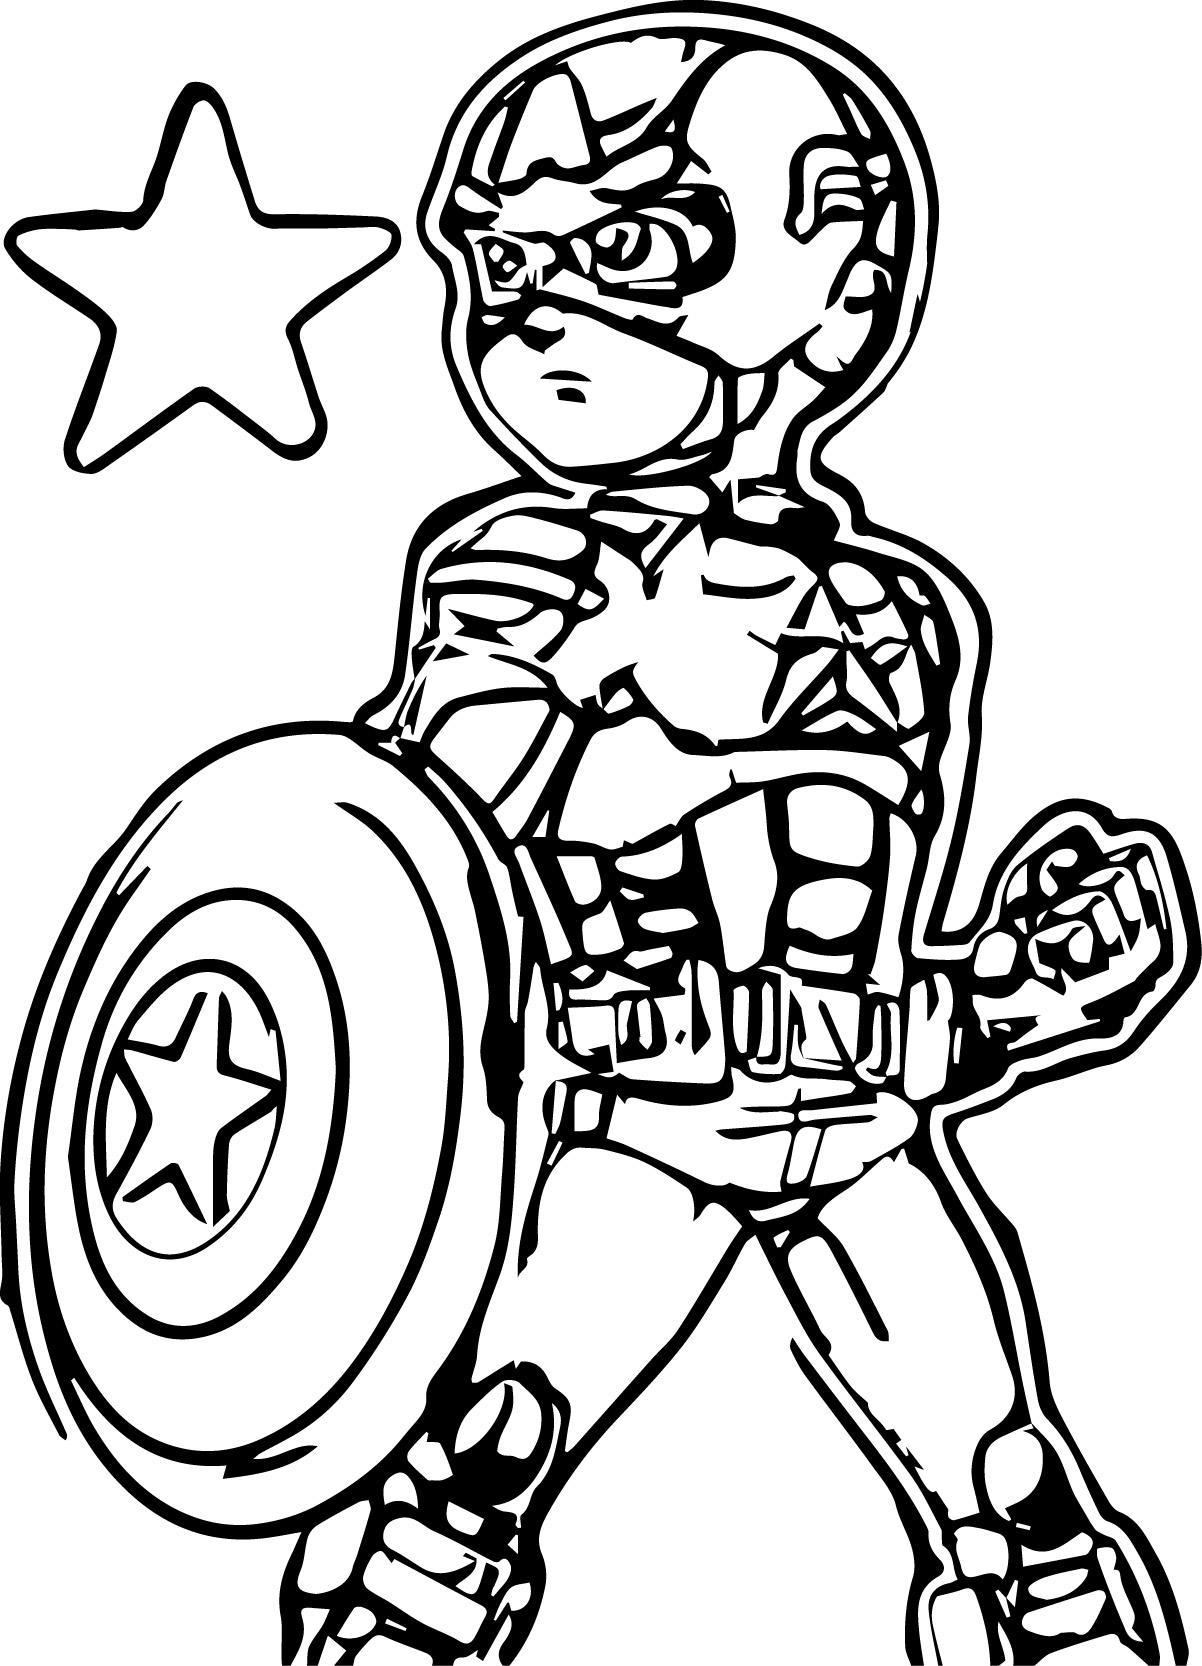 156 dibujos de Capitán américa para colorear | Oh Kids | Page 8